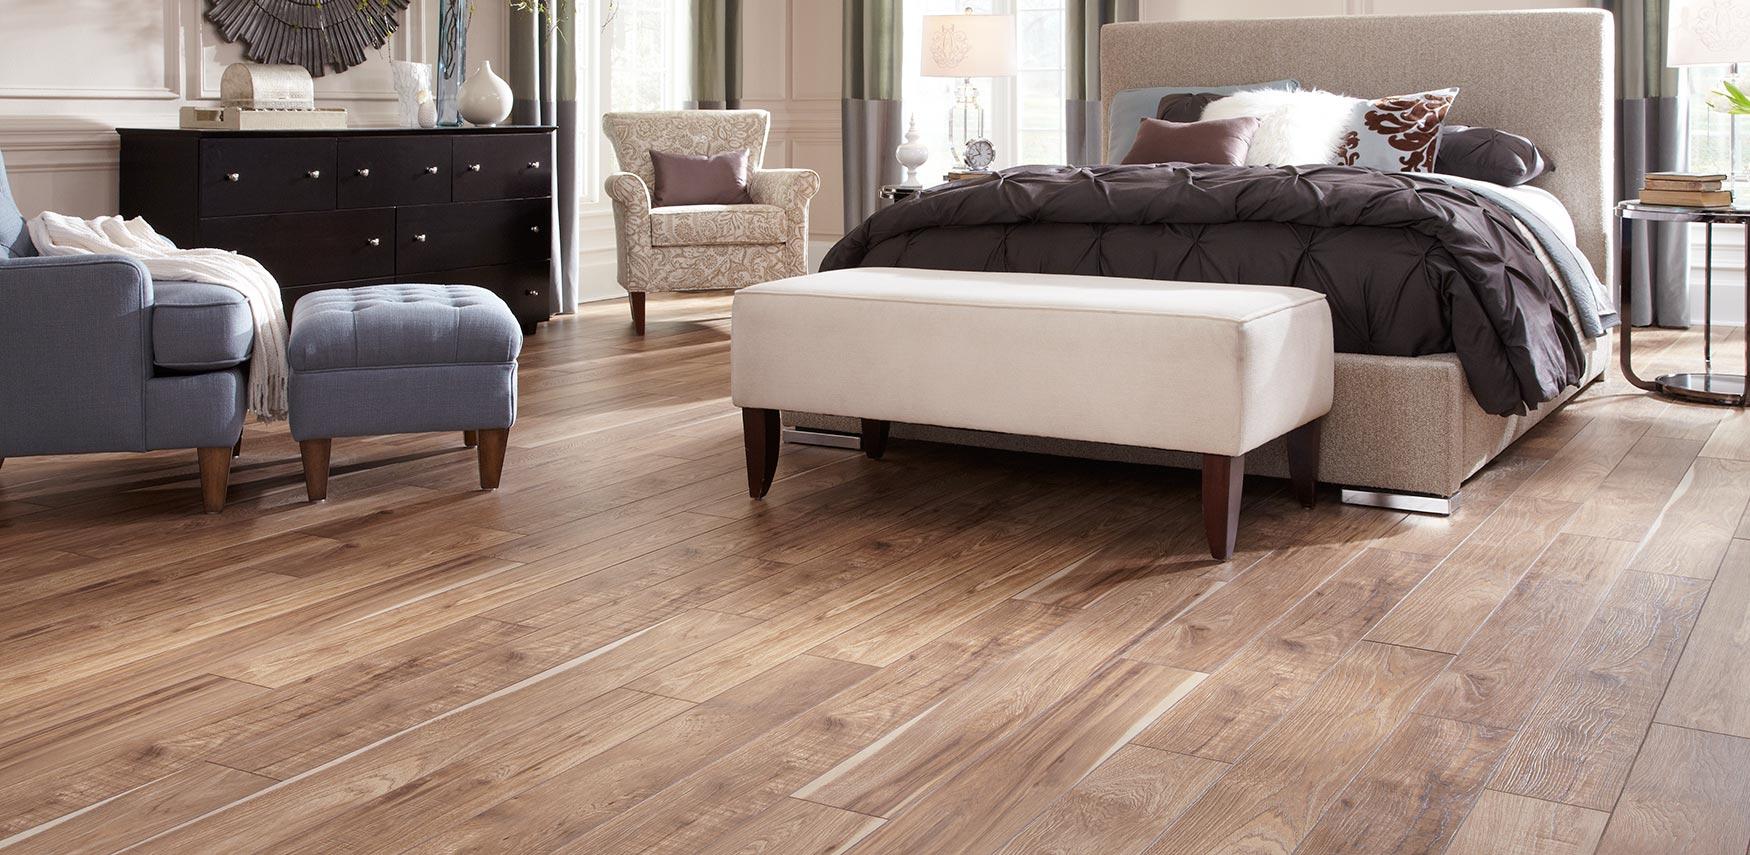 wood floor laminated laminate flooring DAOMVSO